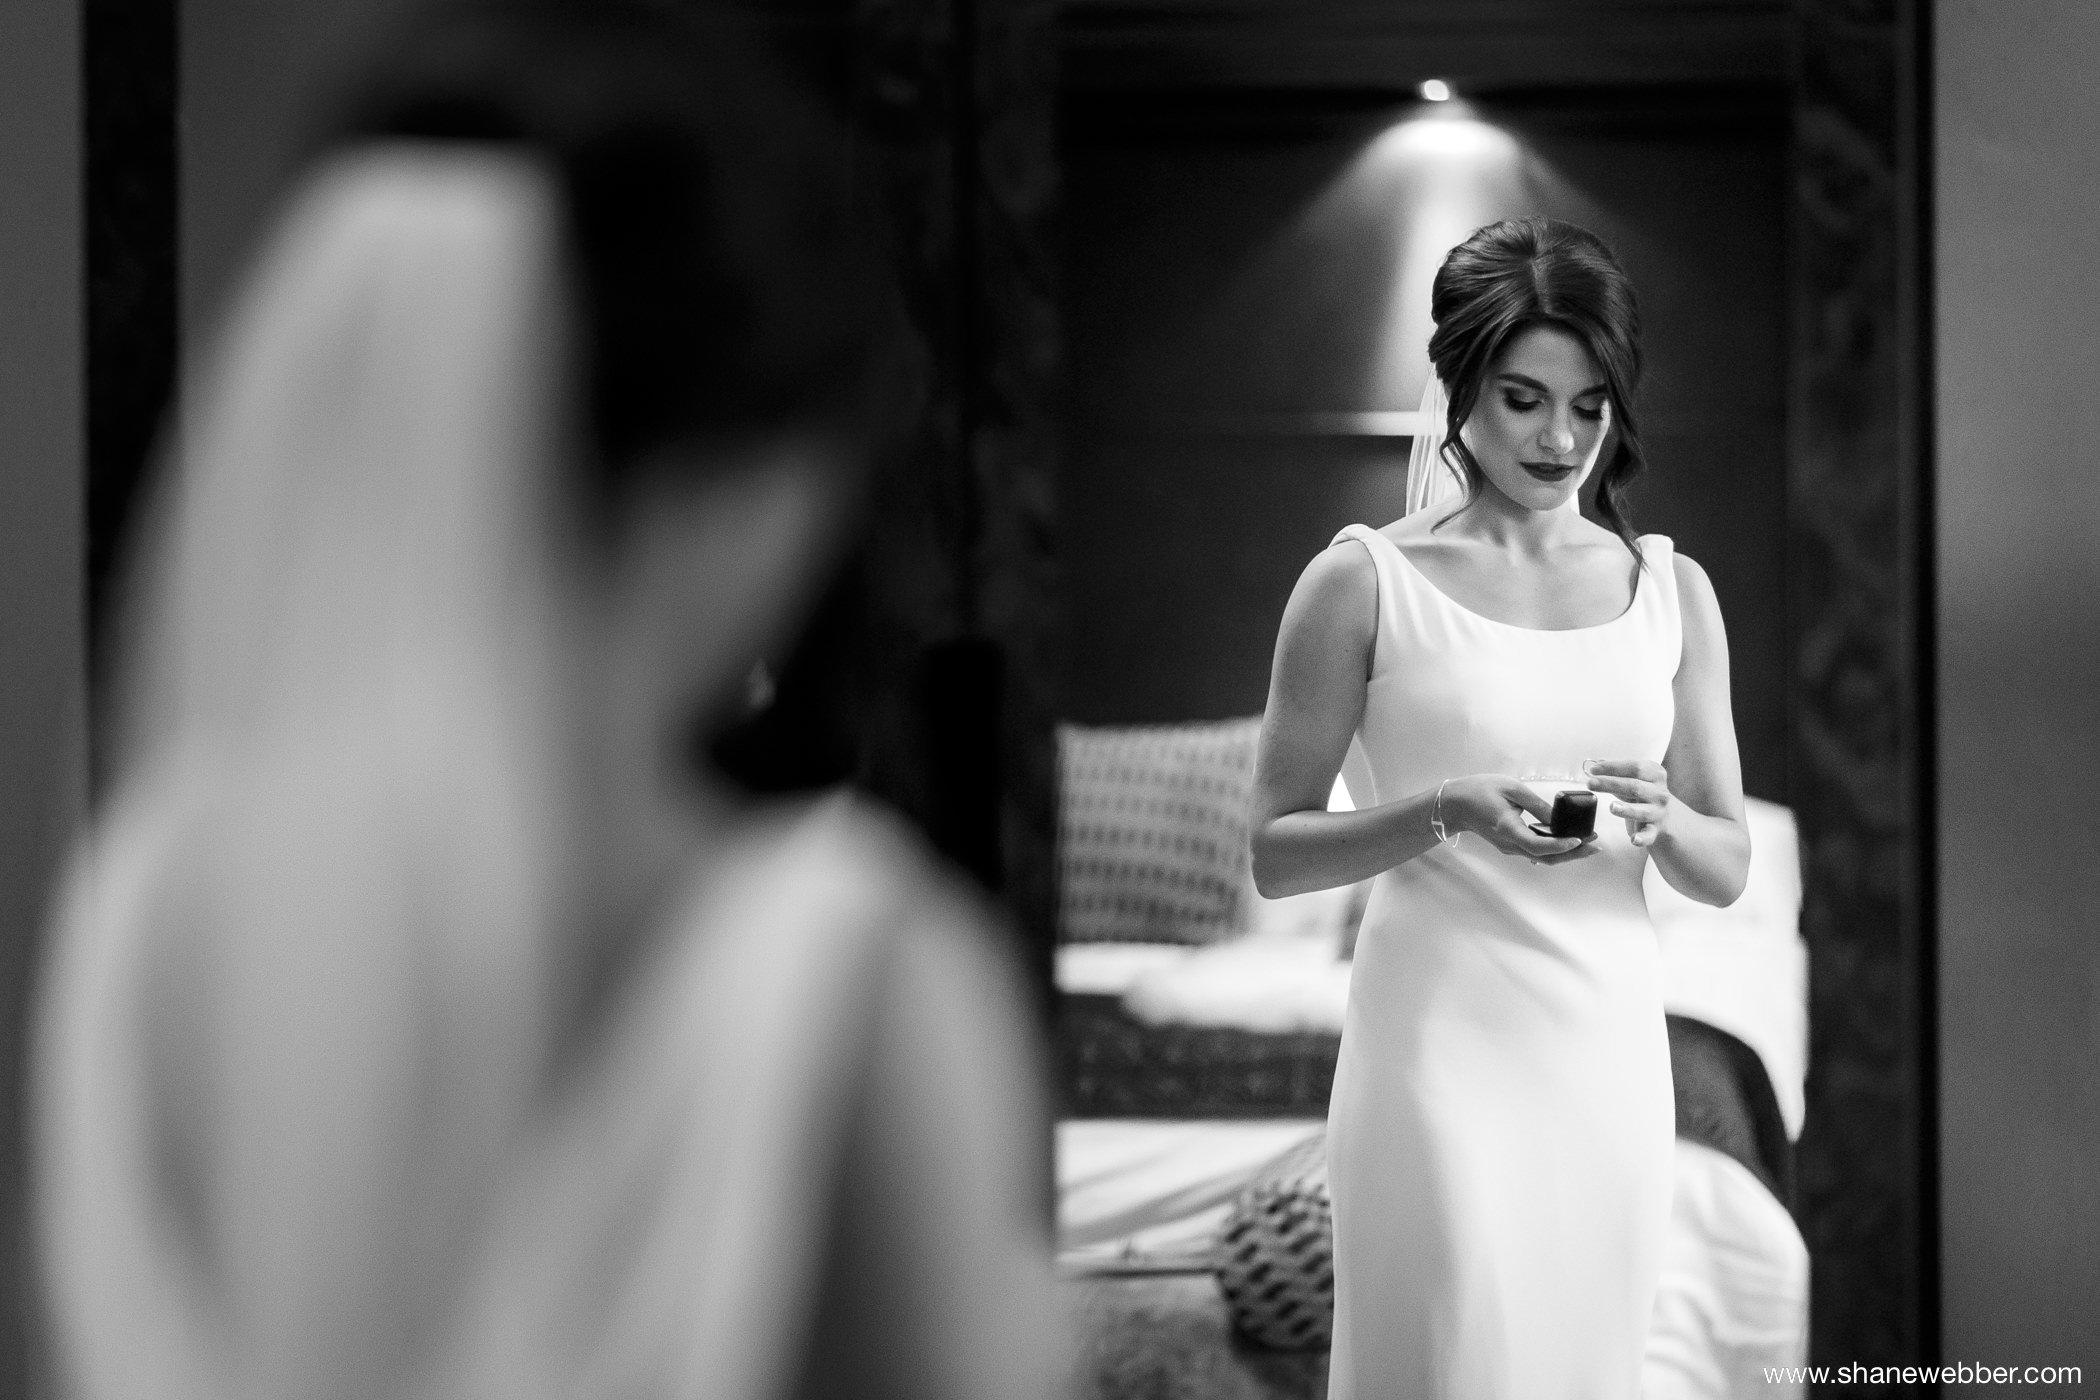 Black and white portrait of the bride